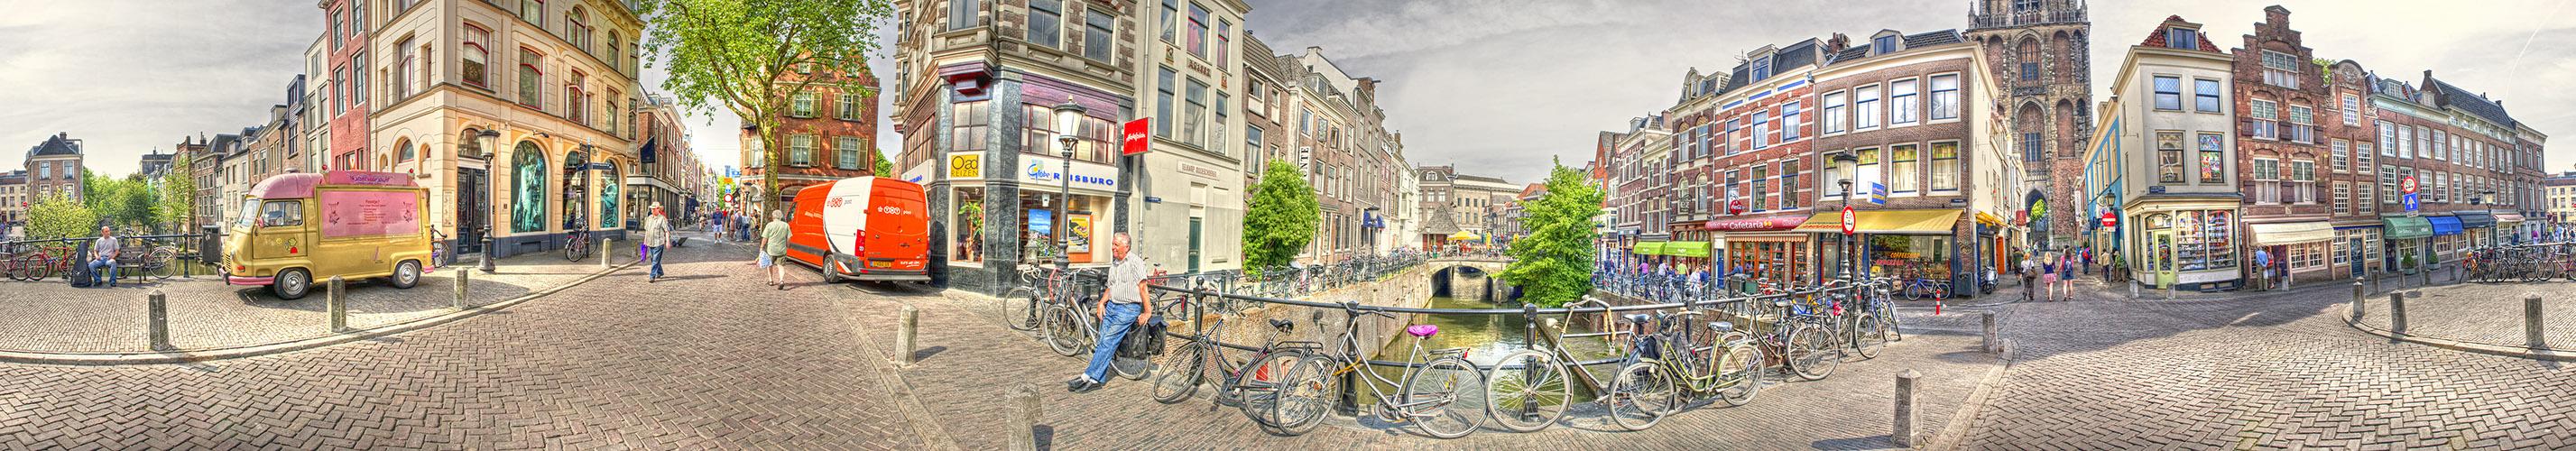 Utrecht fx Panorama HDR 2 01